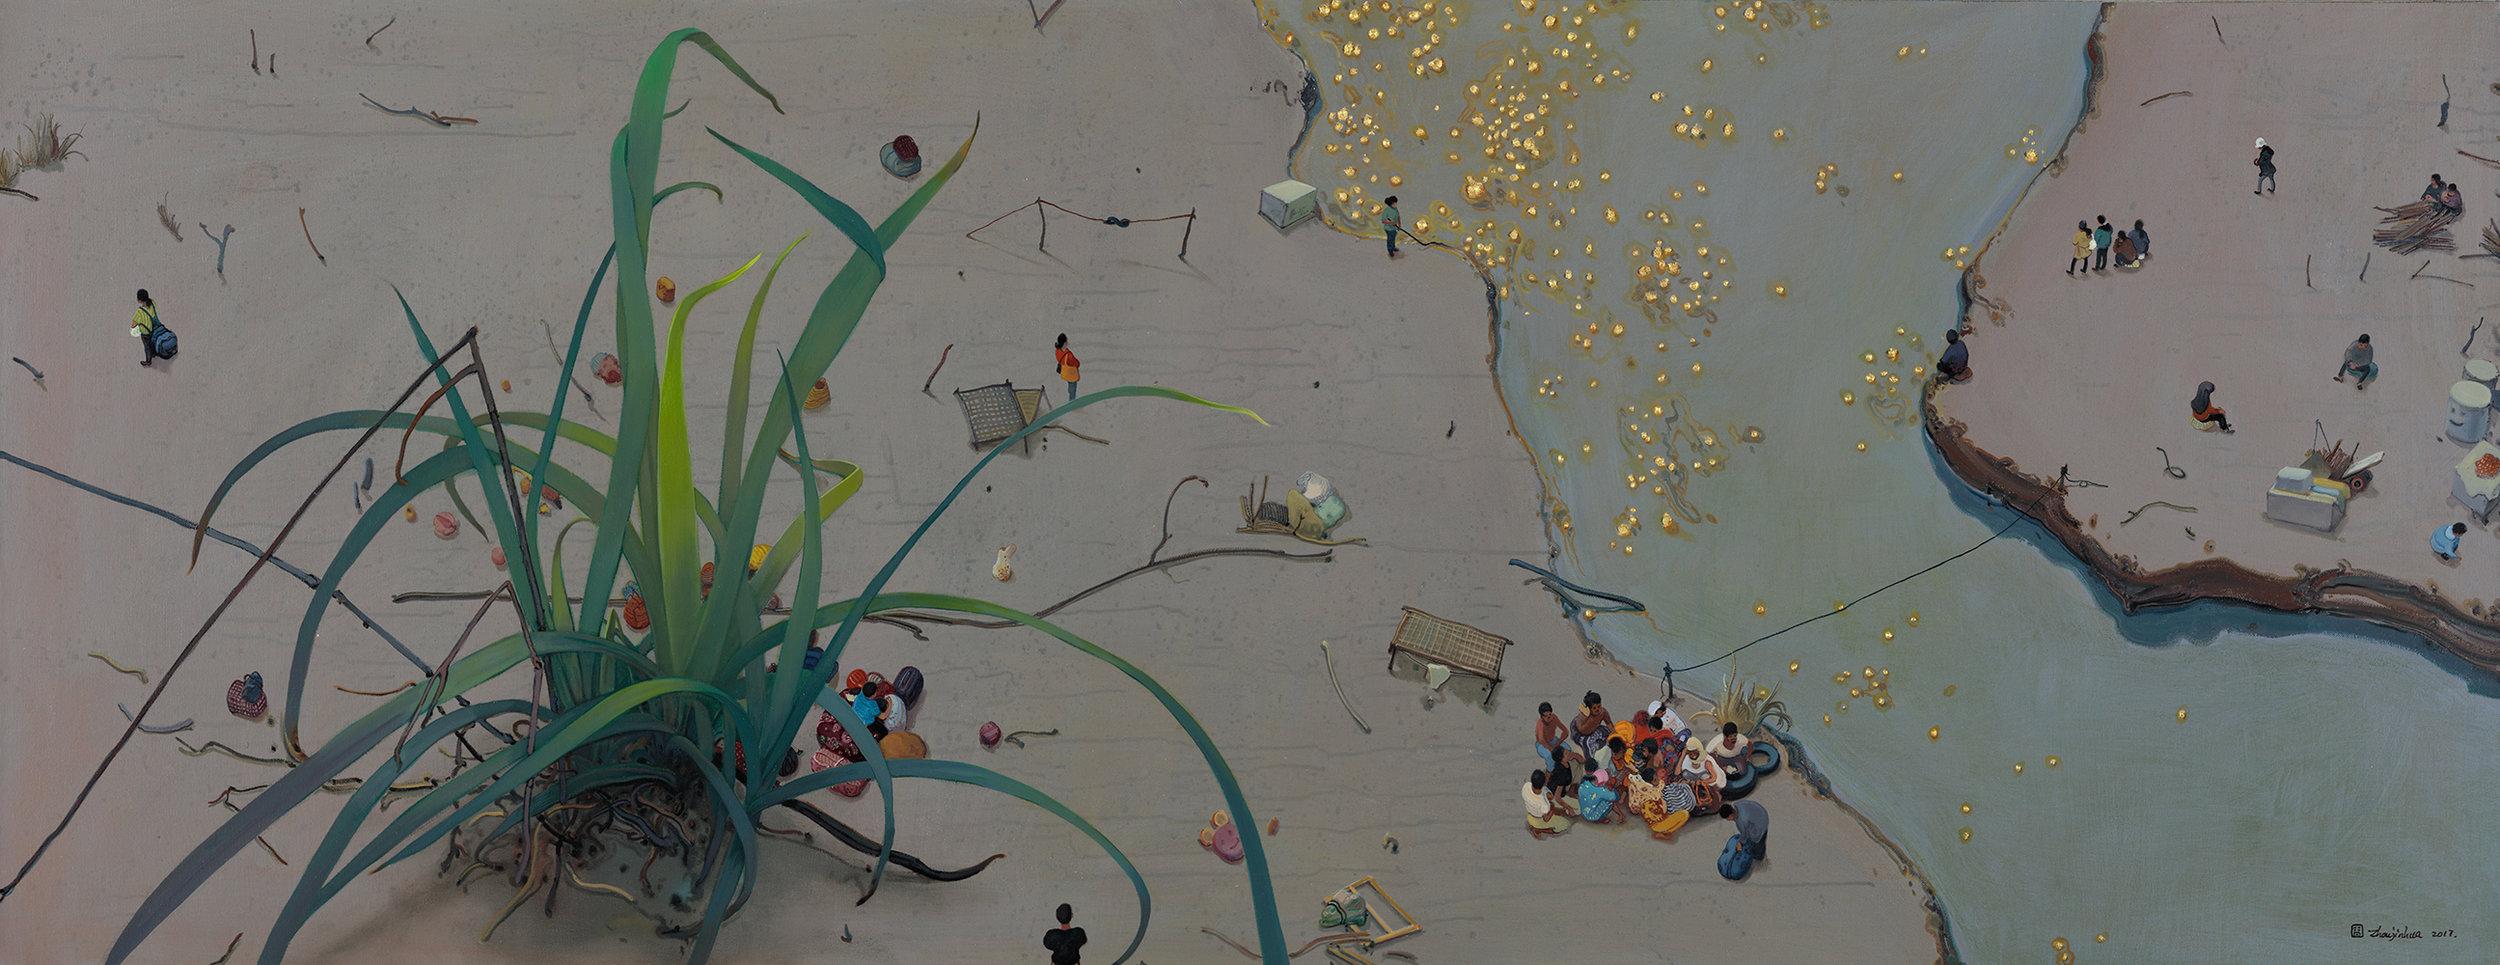 Zhou Jinhua 周金华, Grass and Gold 野草与黄金 No.2, 2017, Mixed media on canvas 布面综合材料, 80 x 210 cm